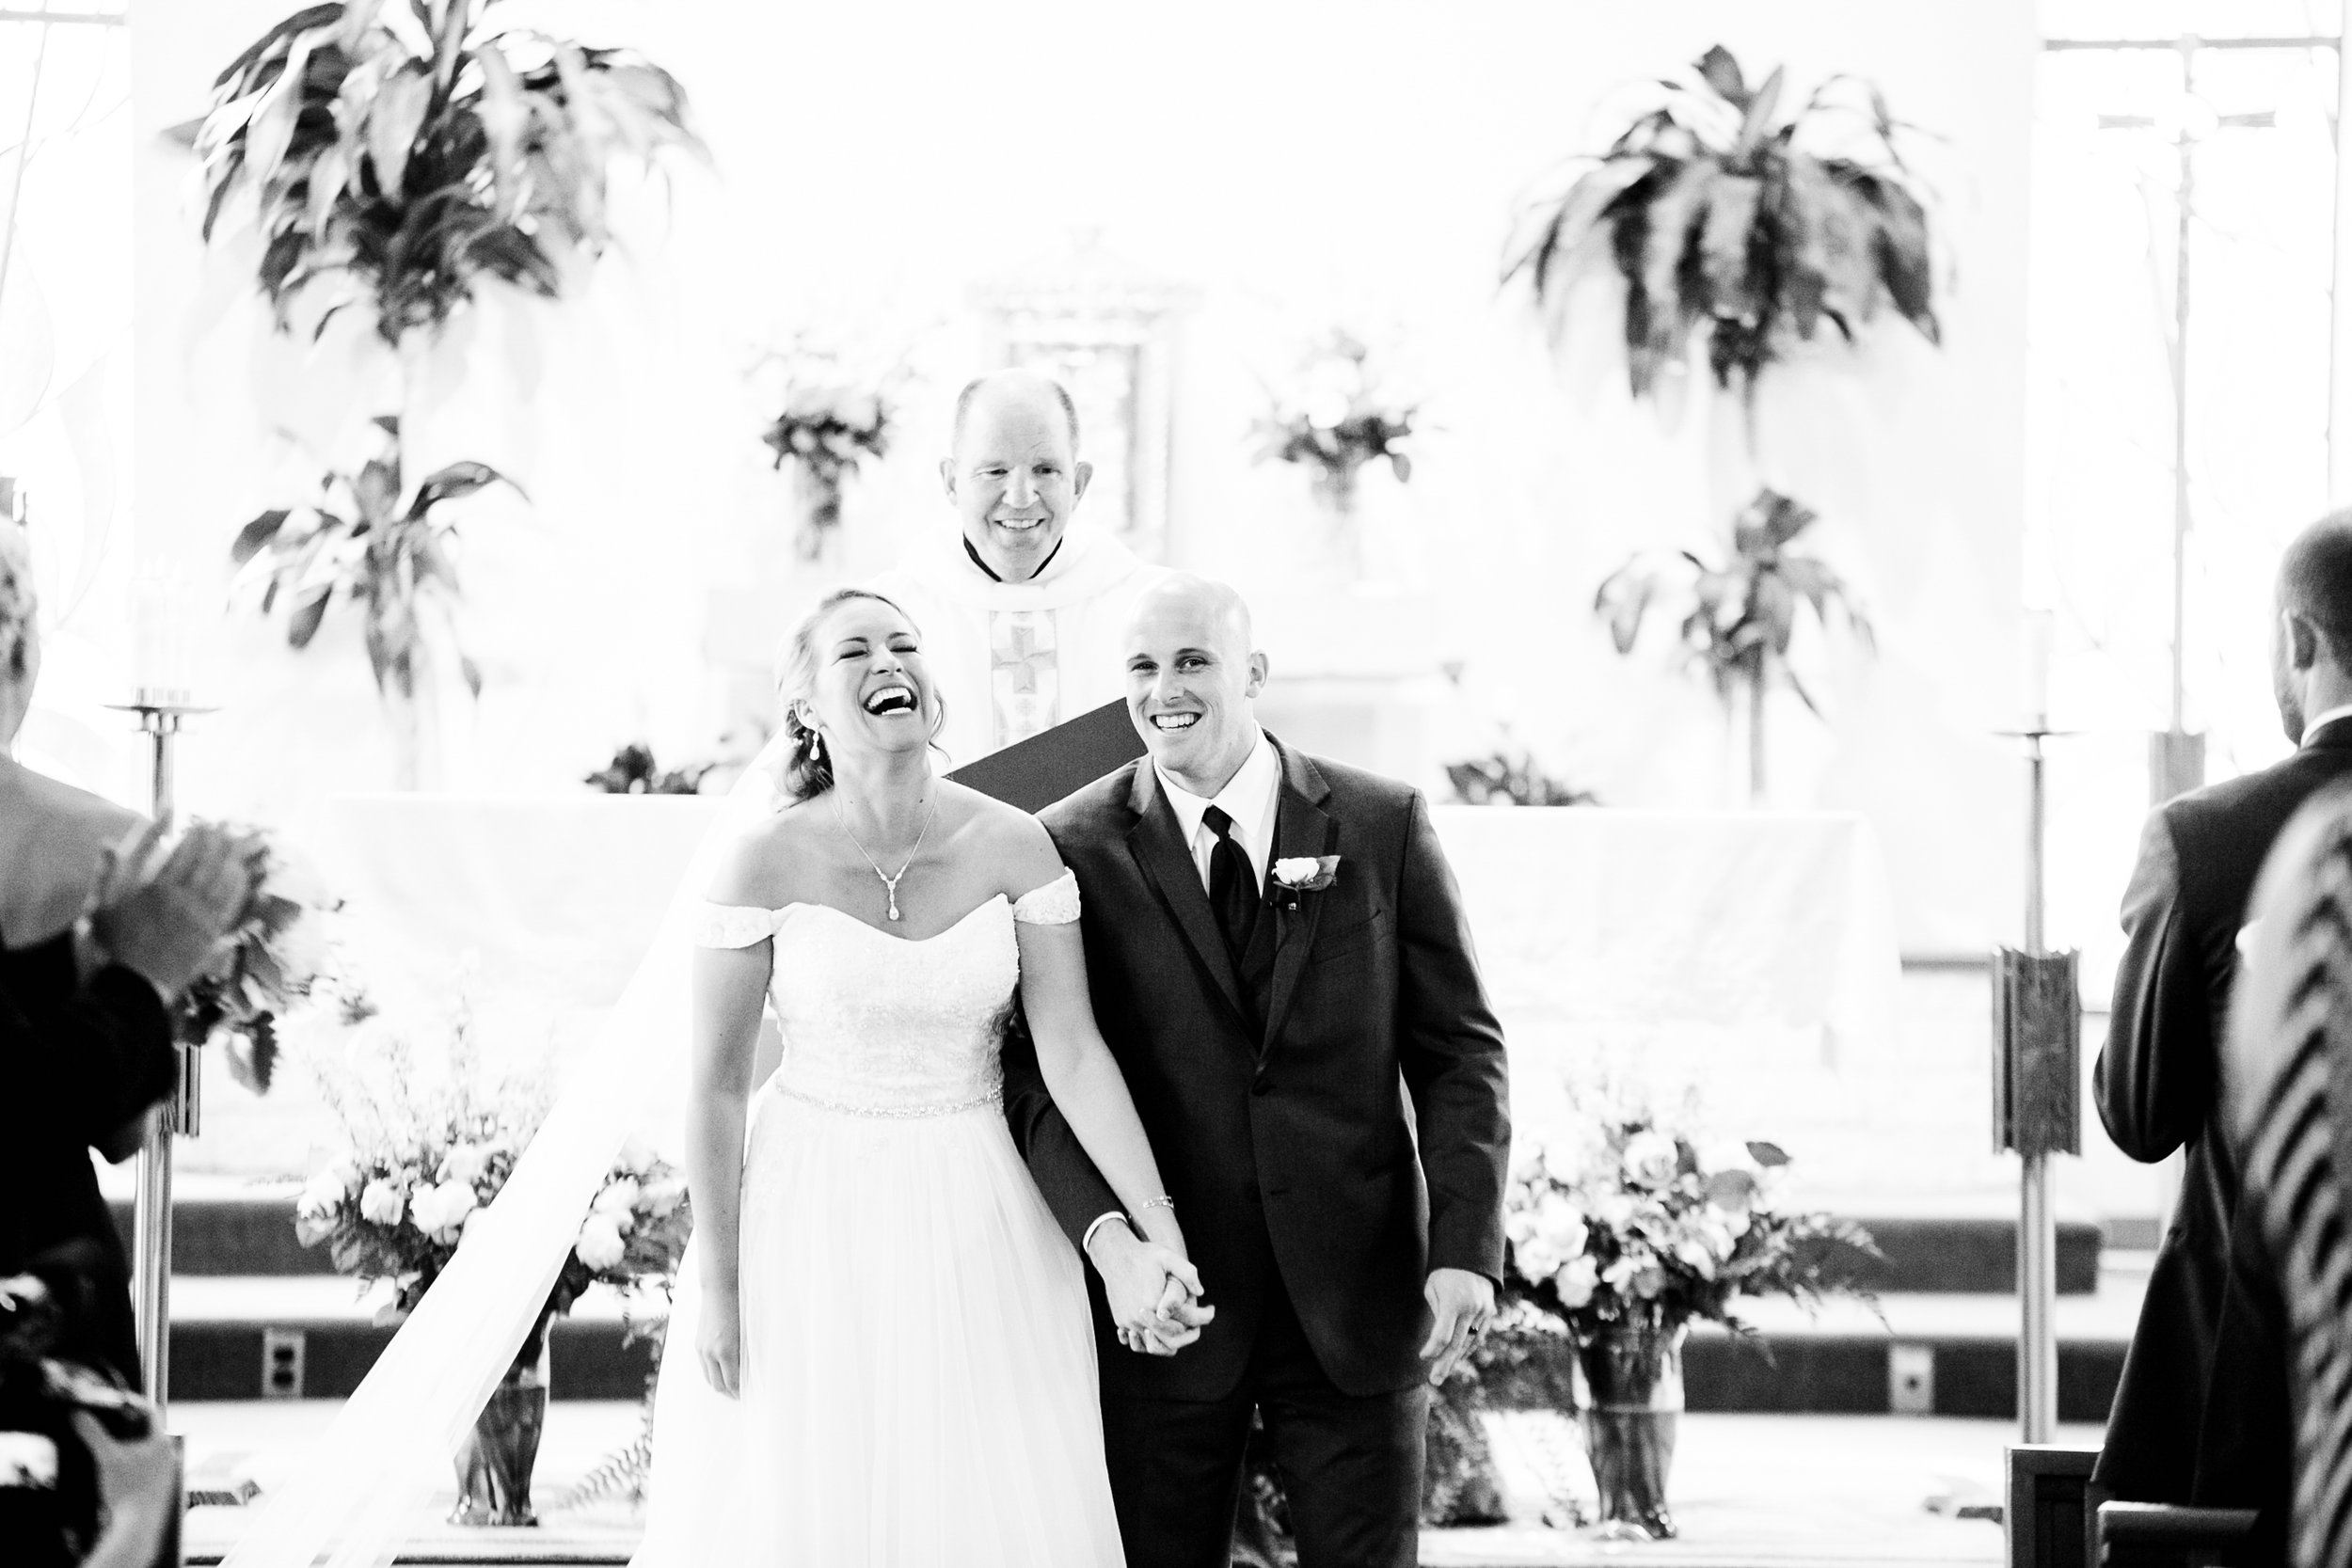 ICONA GOLDEN INN AVALON NJ WEDDING PHOTOGRAPHY  - 053.jpg